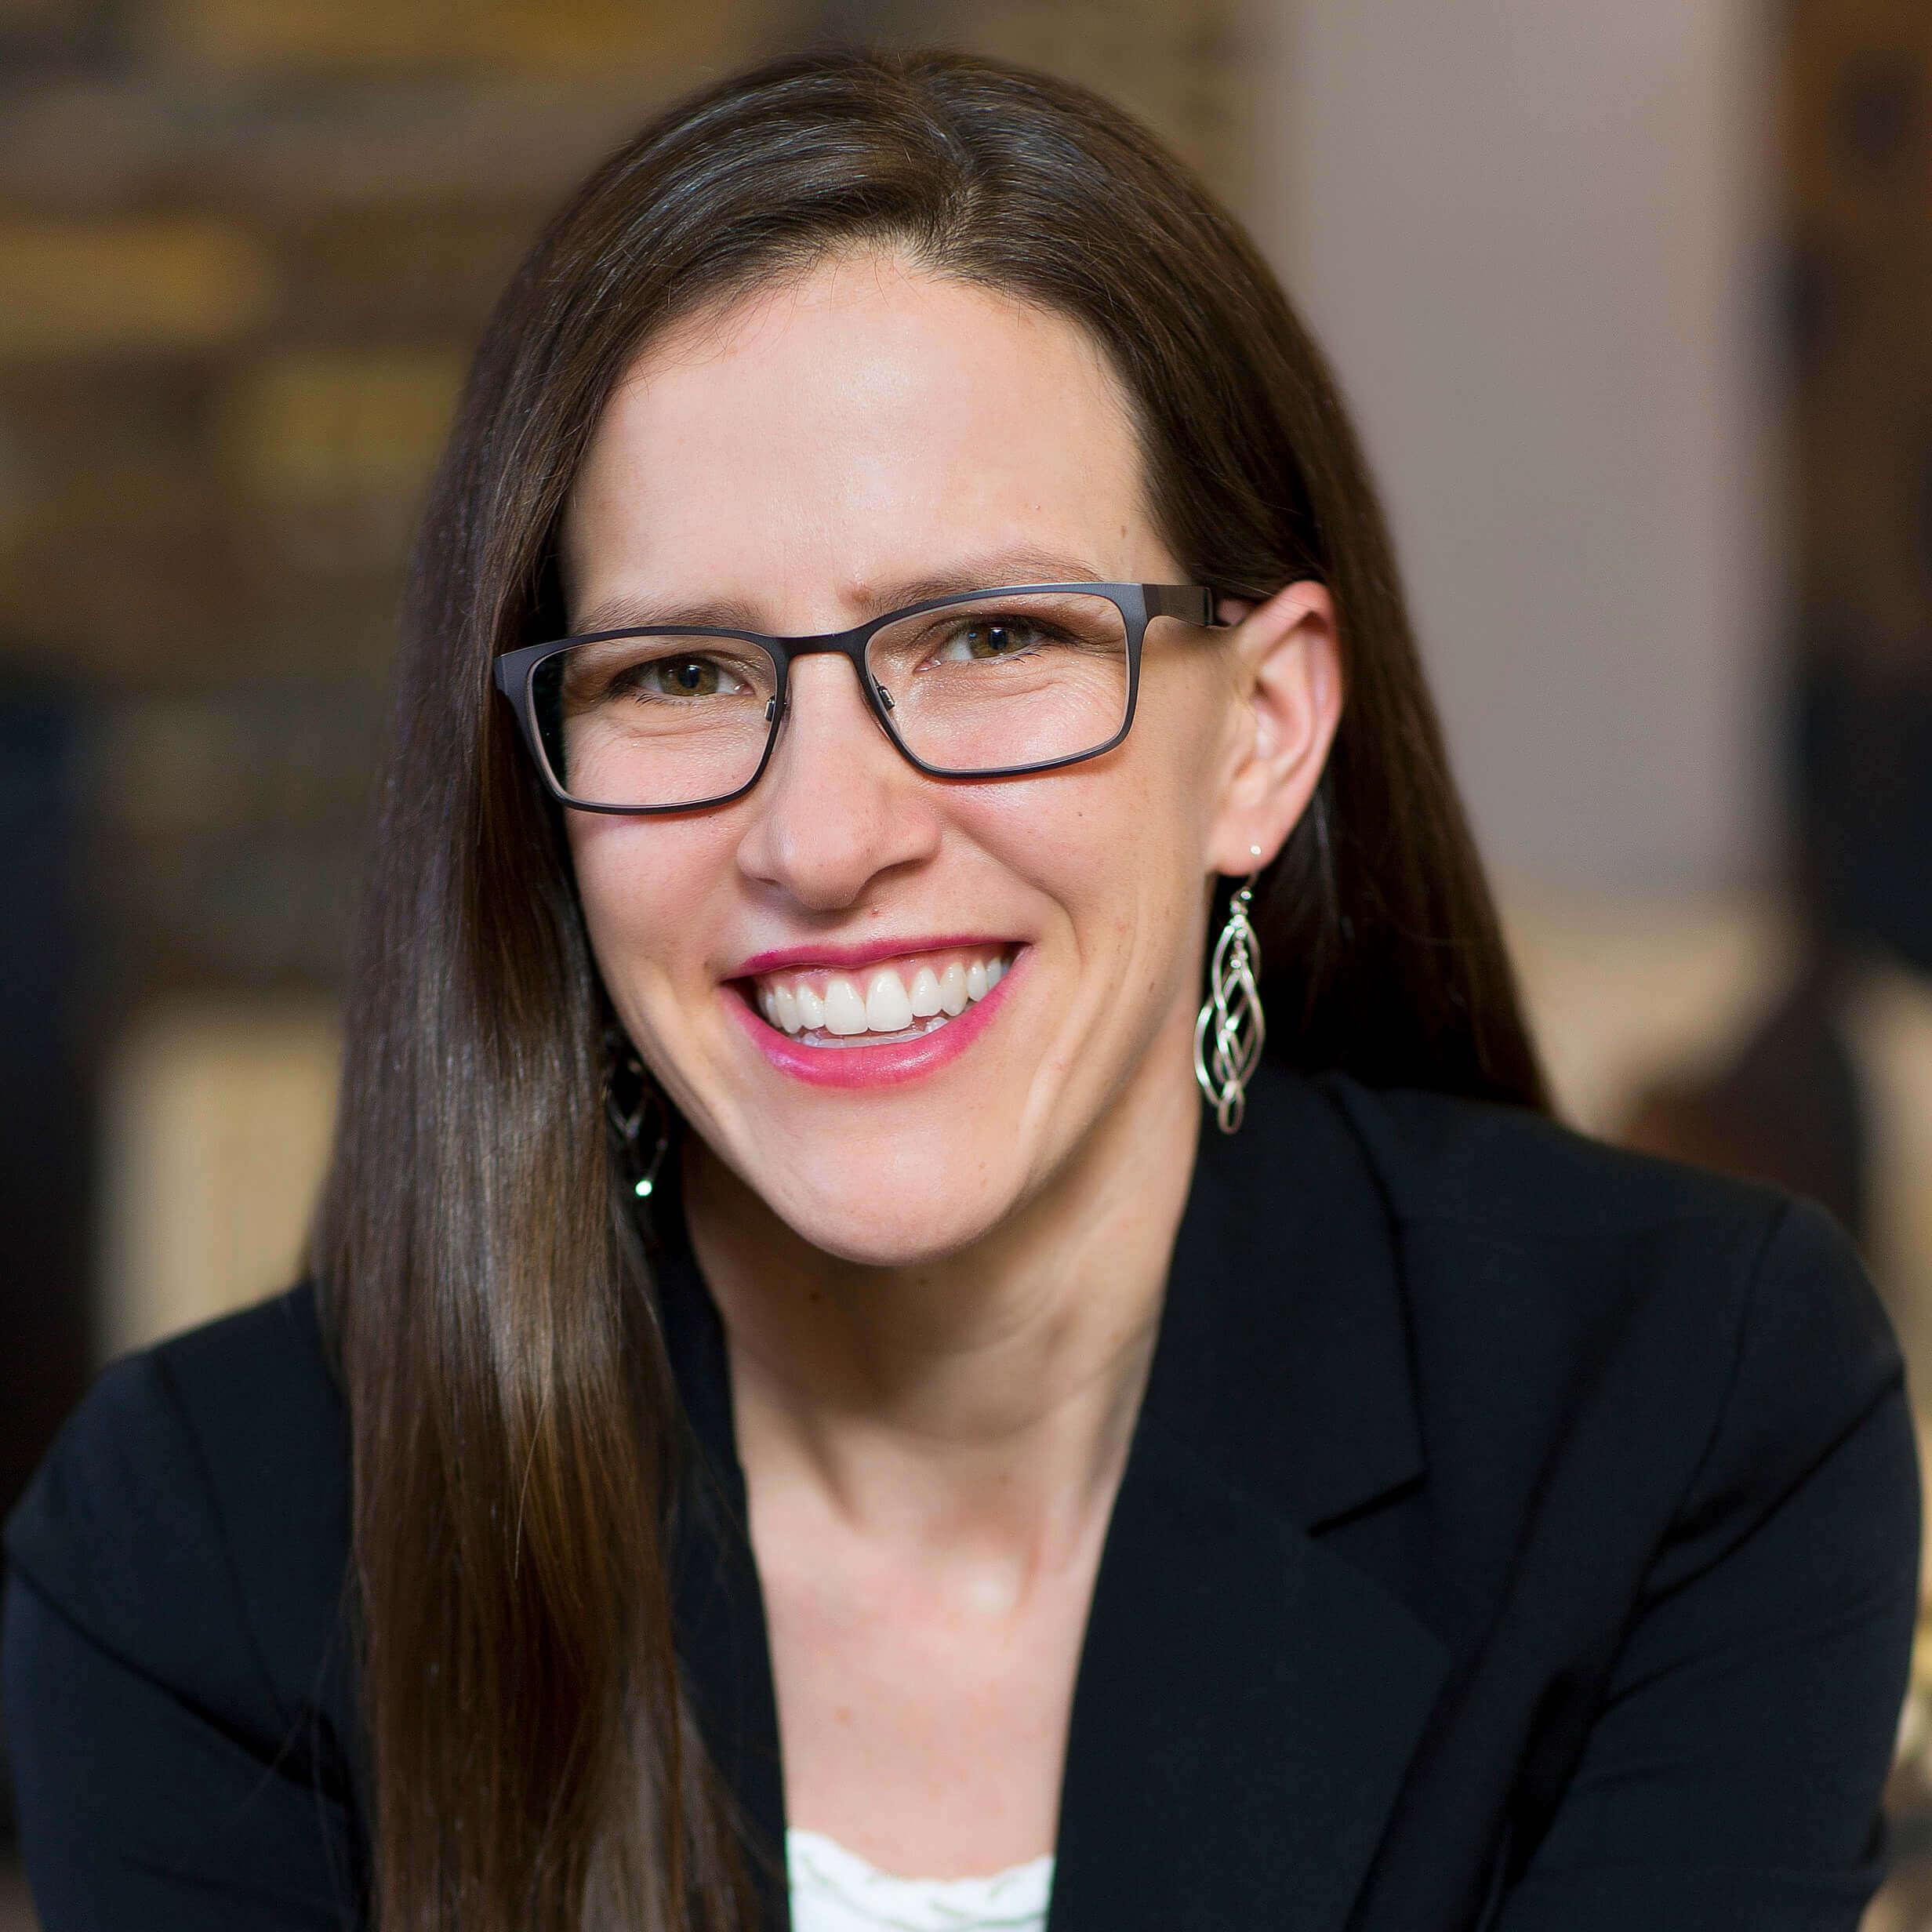 Picture of Elizabeth ErkenBrack, Ph.D